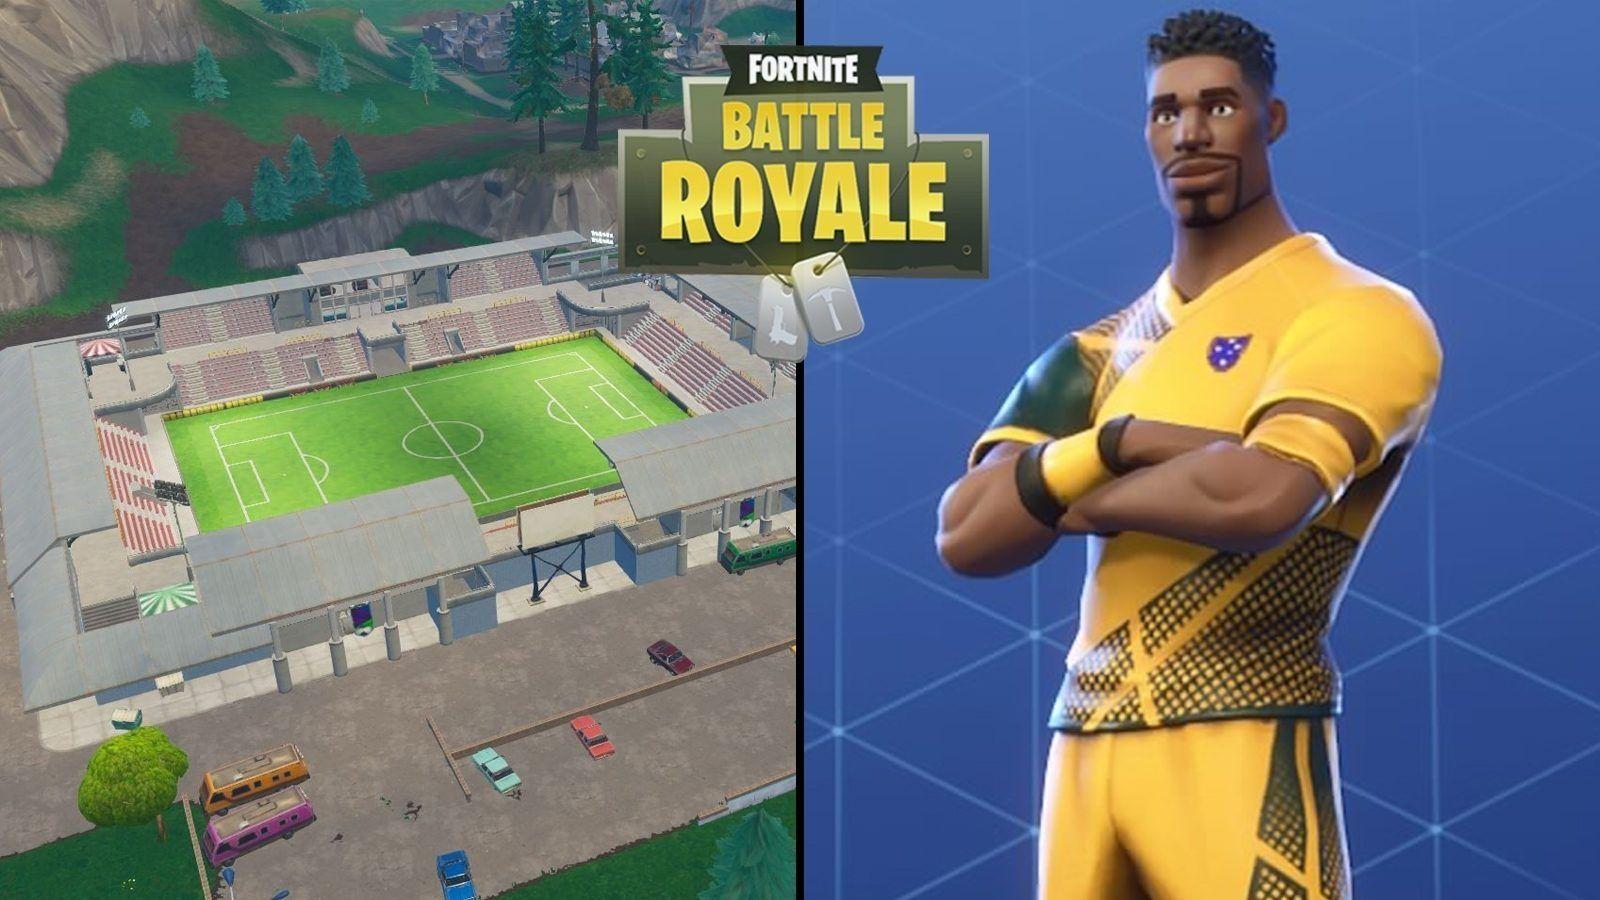 Zombie Soccer Player Fortnite Skin Super Striker Fortnite Wallpapers Wallpaper Cave In 2020